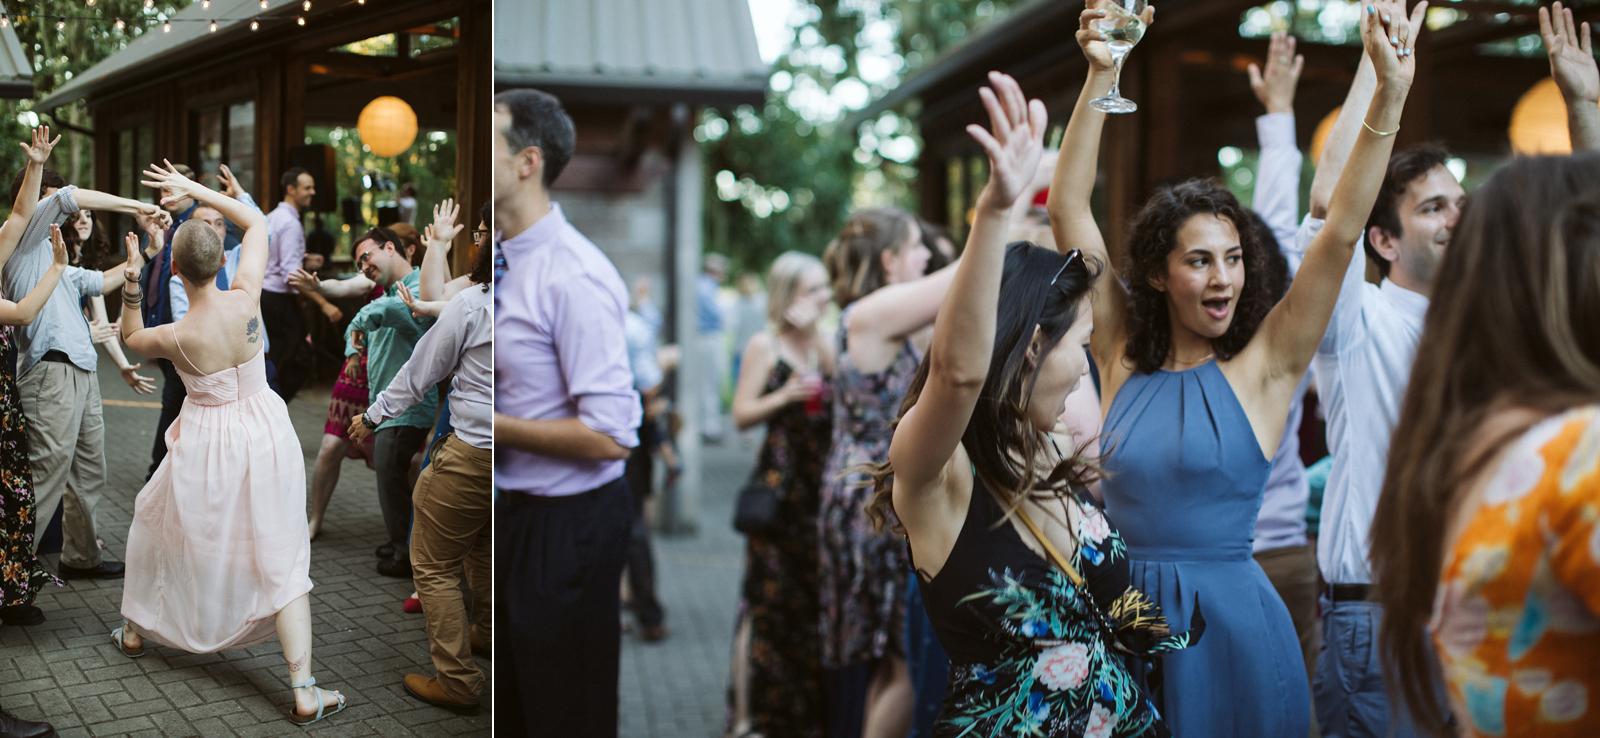 136-daronjackson-rachel-michael-wedding-mtpisgah.jpg